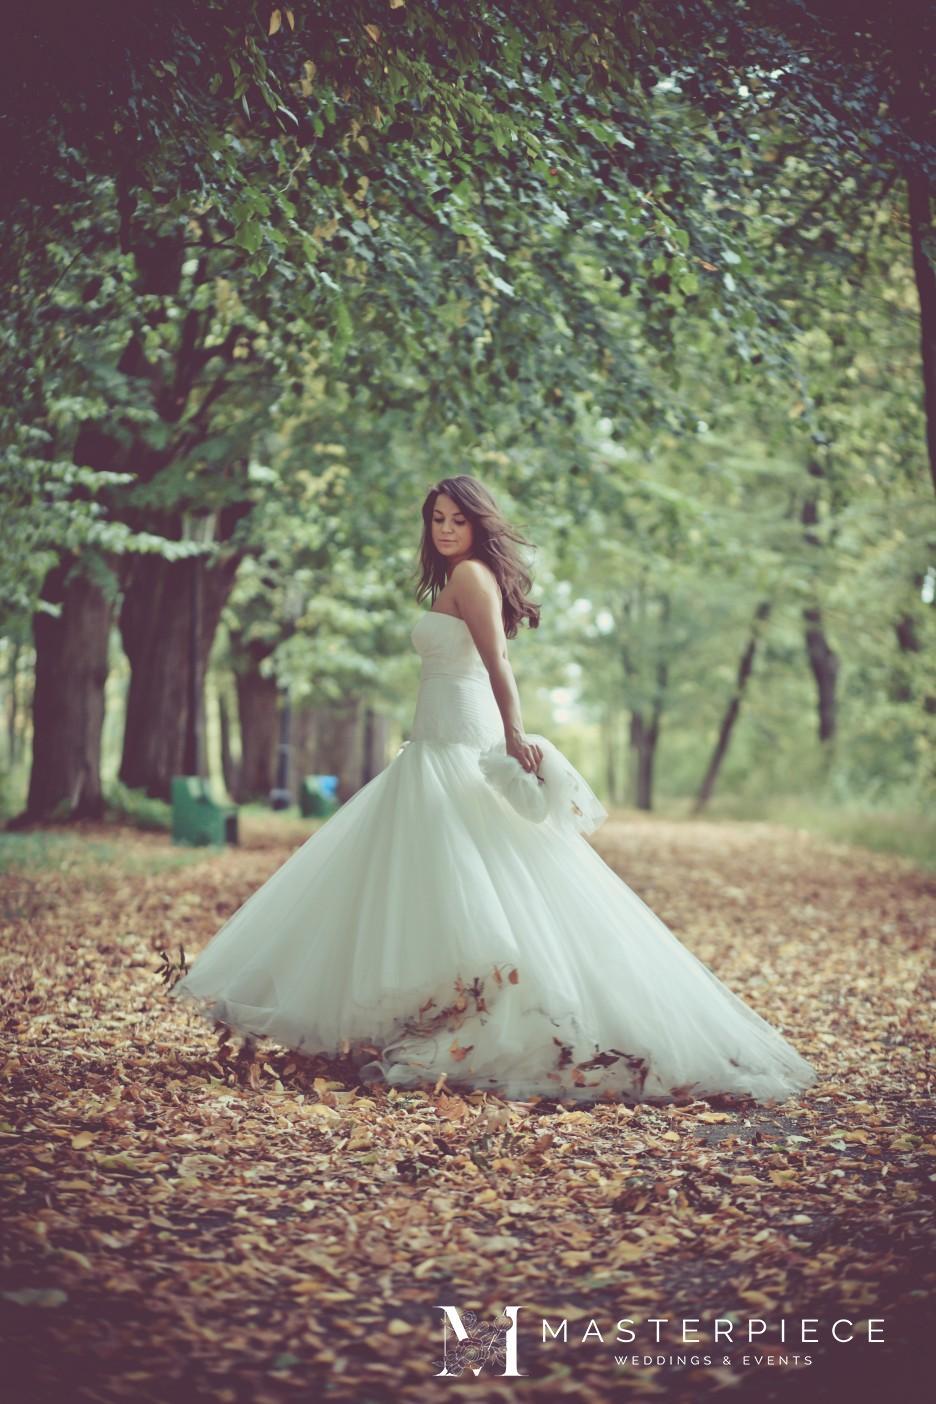 Masterpiece_Weddings_sluby_016